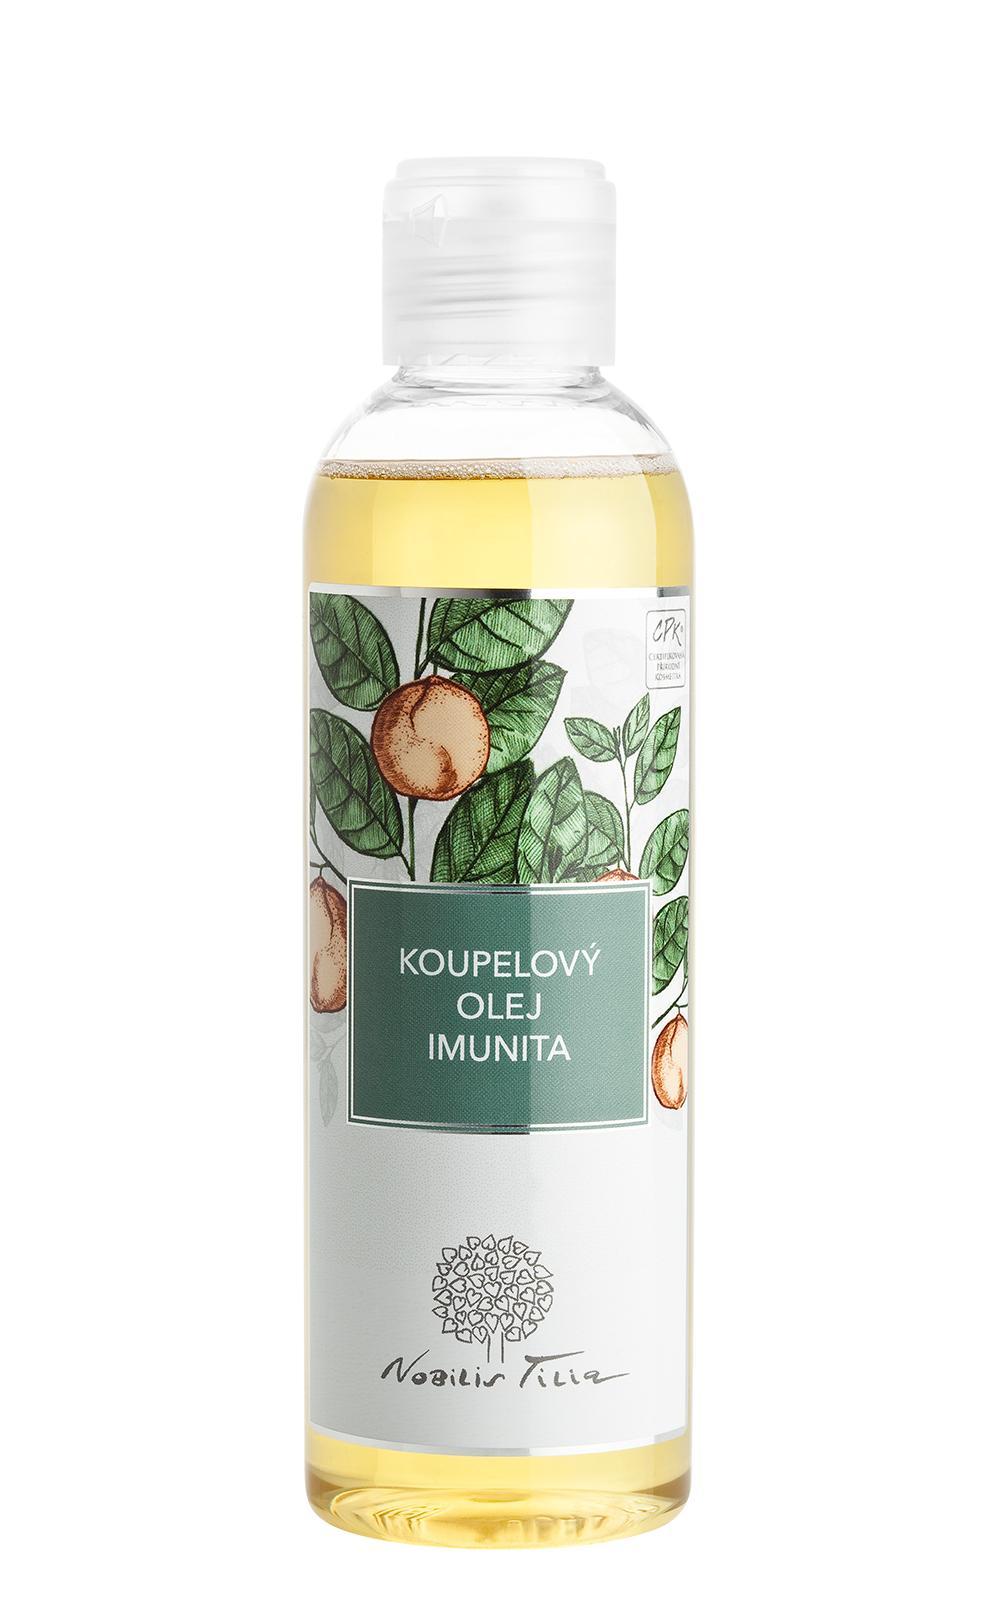 Nobilis Tilia Koupelový olej IMUNITA - 200 200 ml